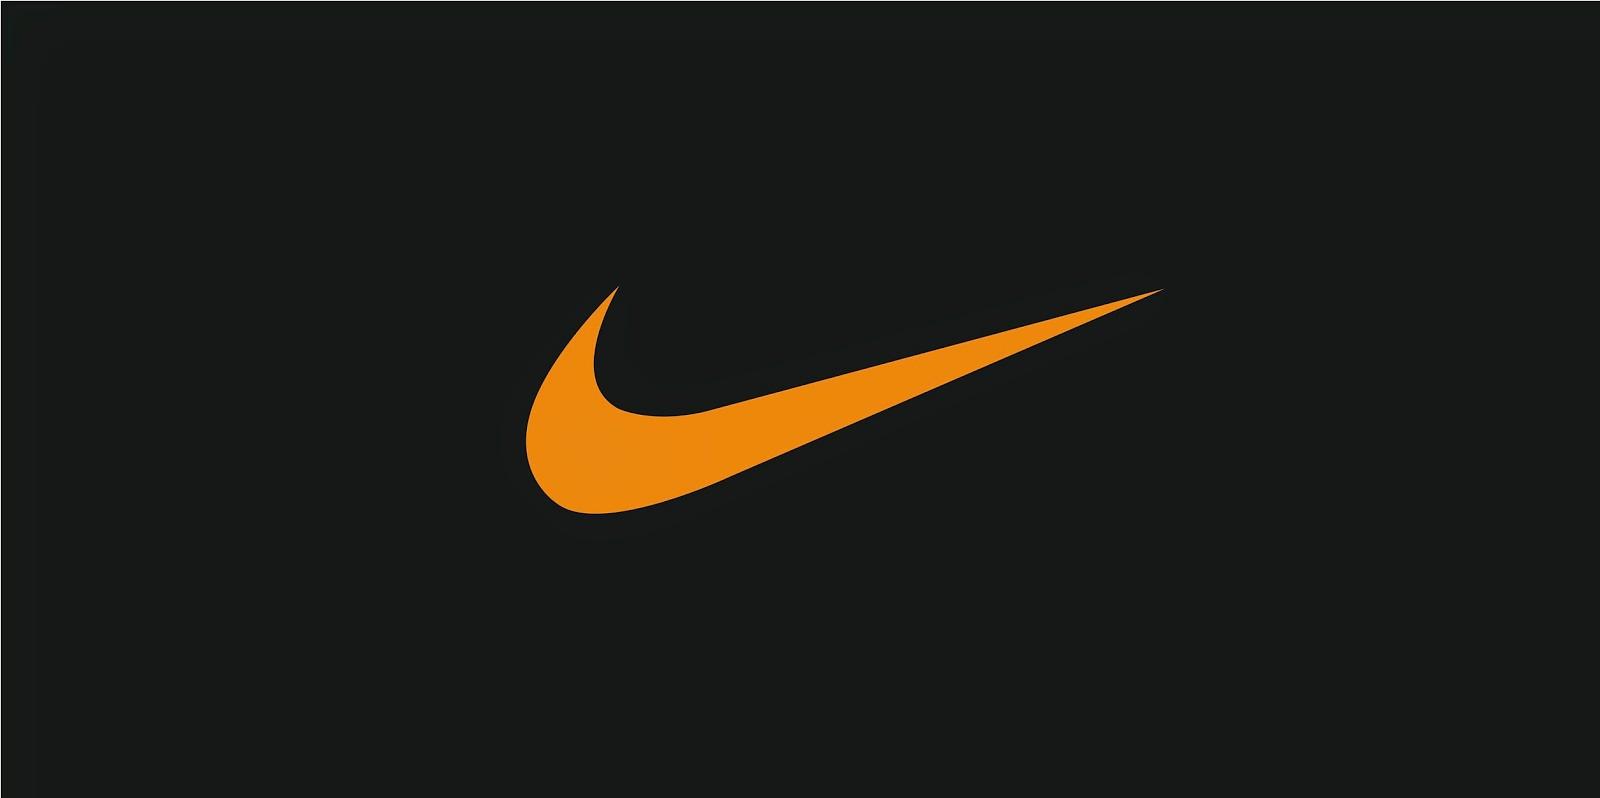 Cool Nike Logos 102 103171 Images HD Wallpapers Wallfoycom 1600x798